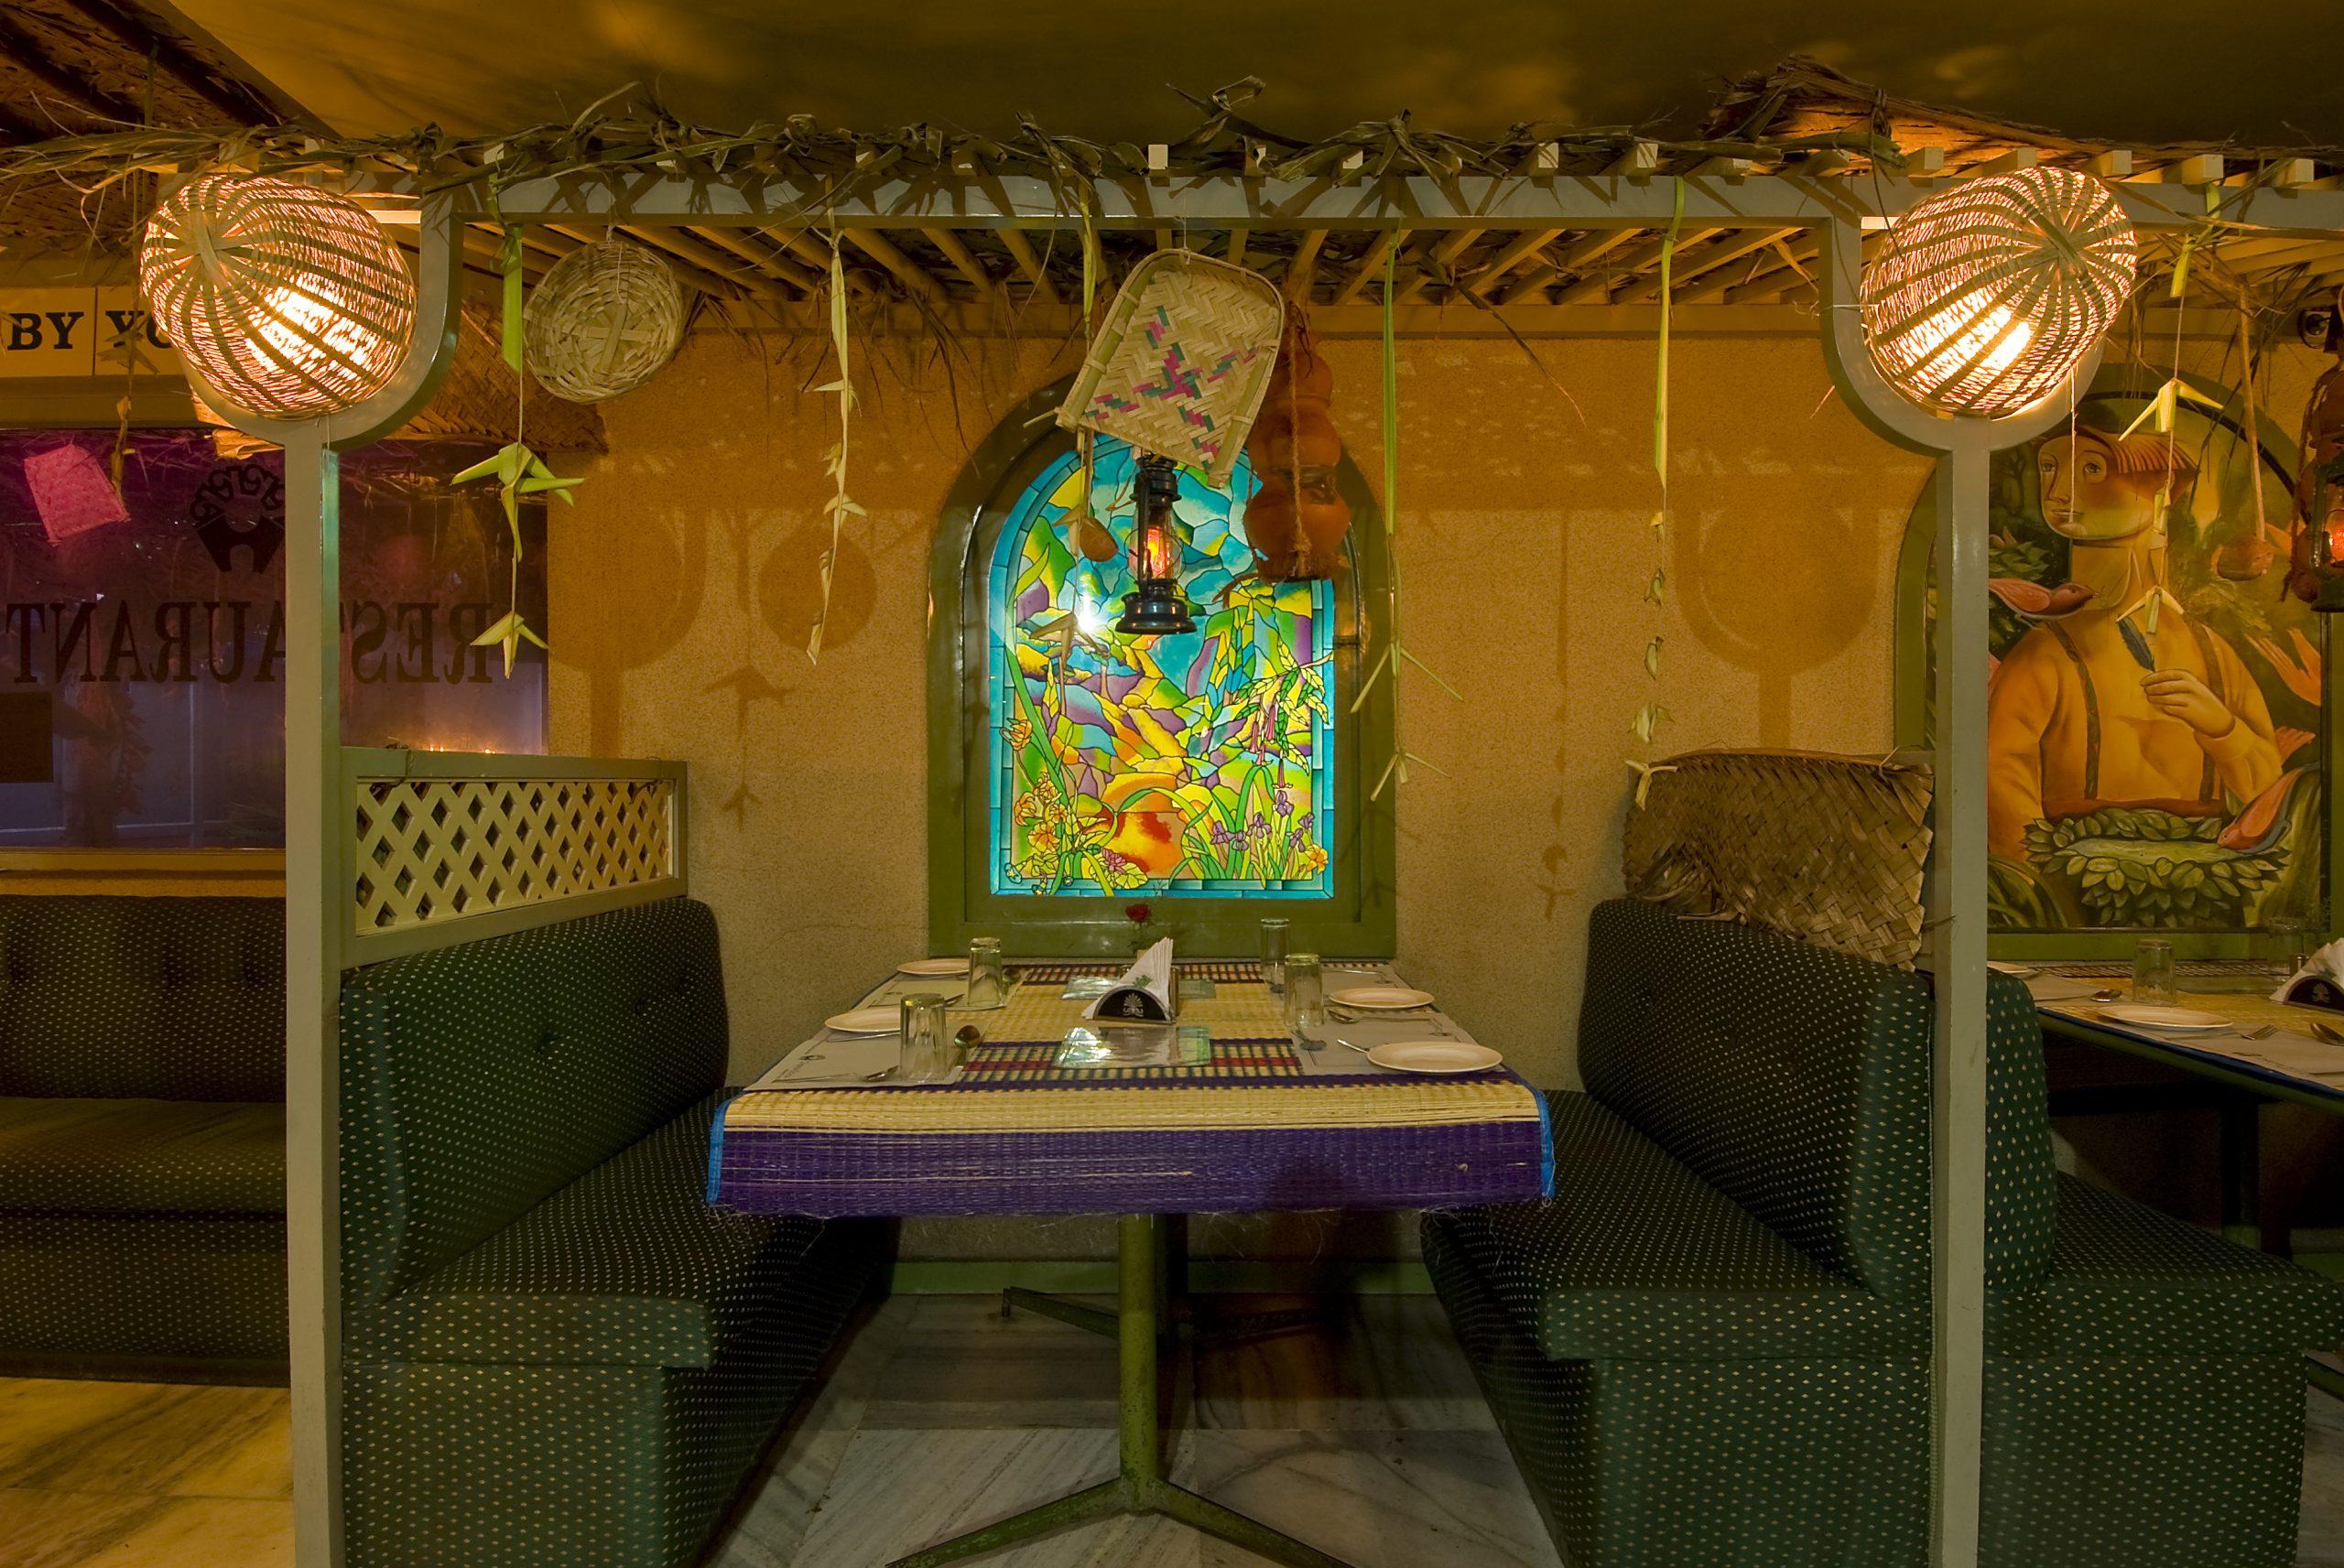 Ramyas-Hotels-Meridian-Restaurant-Trichy-0009-scaled